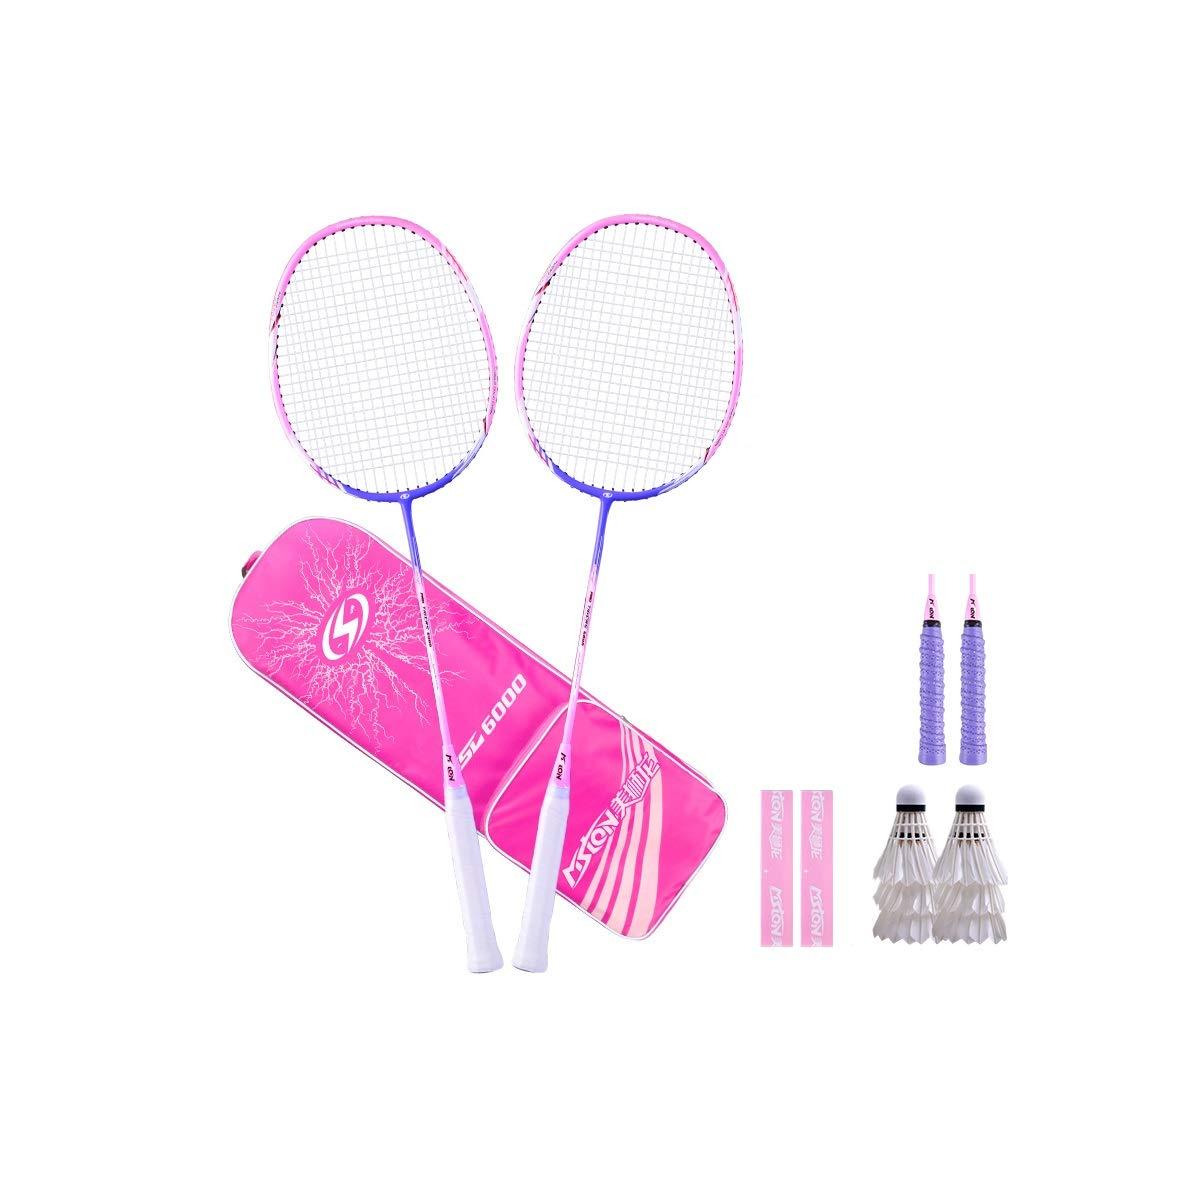 Badminton Racket, Ultra-Light Carbon Adult Resistant to Durable, Men and Women Double Shot Suit Offensive Full, Multi-Color (Color : A5)